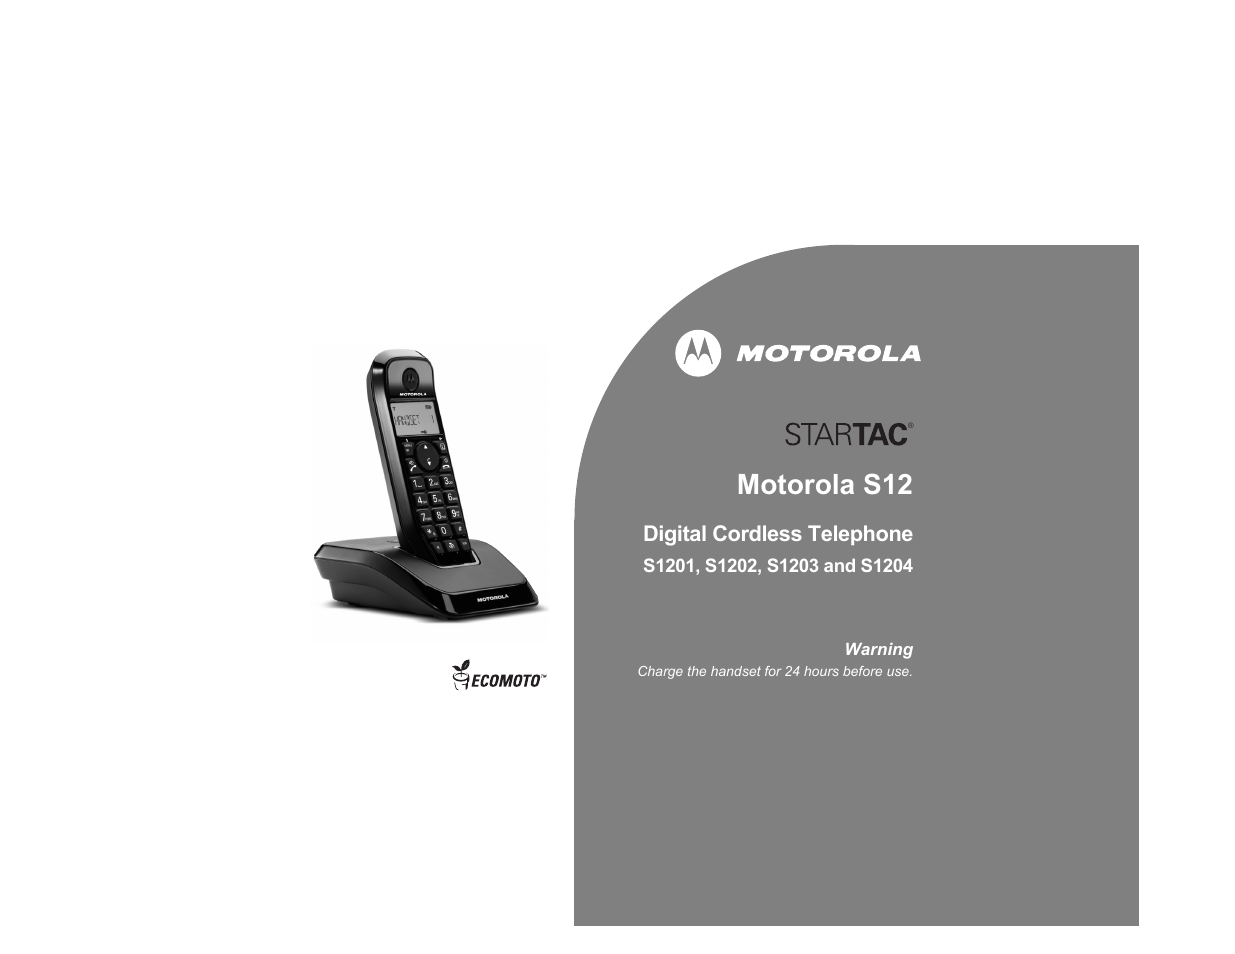 motorola s1201 user manual 39 pages also for s1202 s1204 s1203 rh manualsdir com motorola cordless phone manual d411a motorola cordless phone manual l803